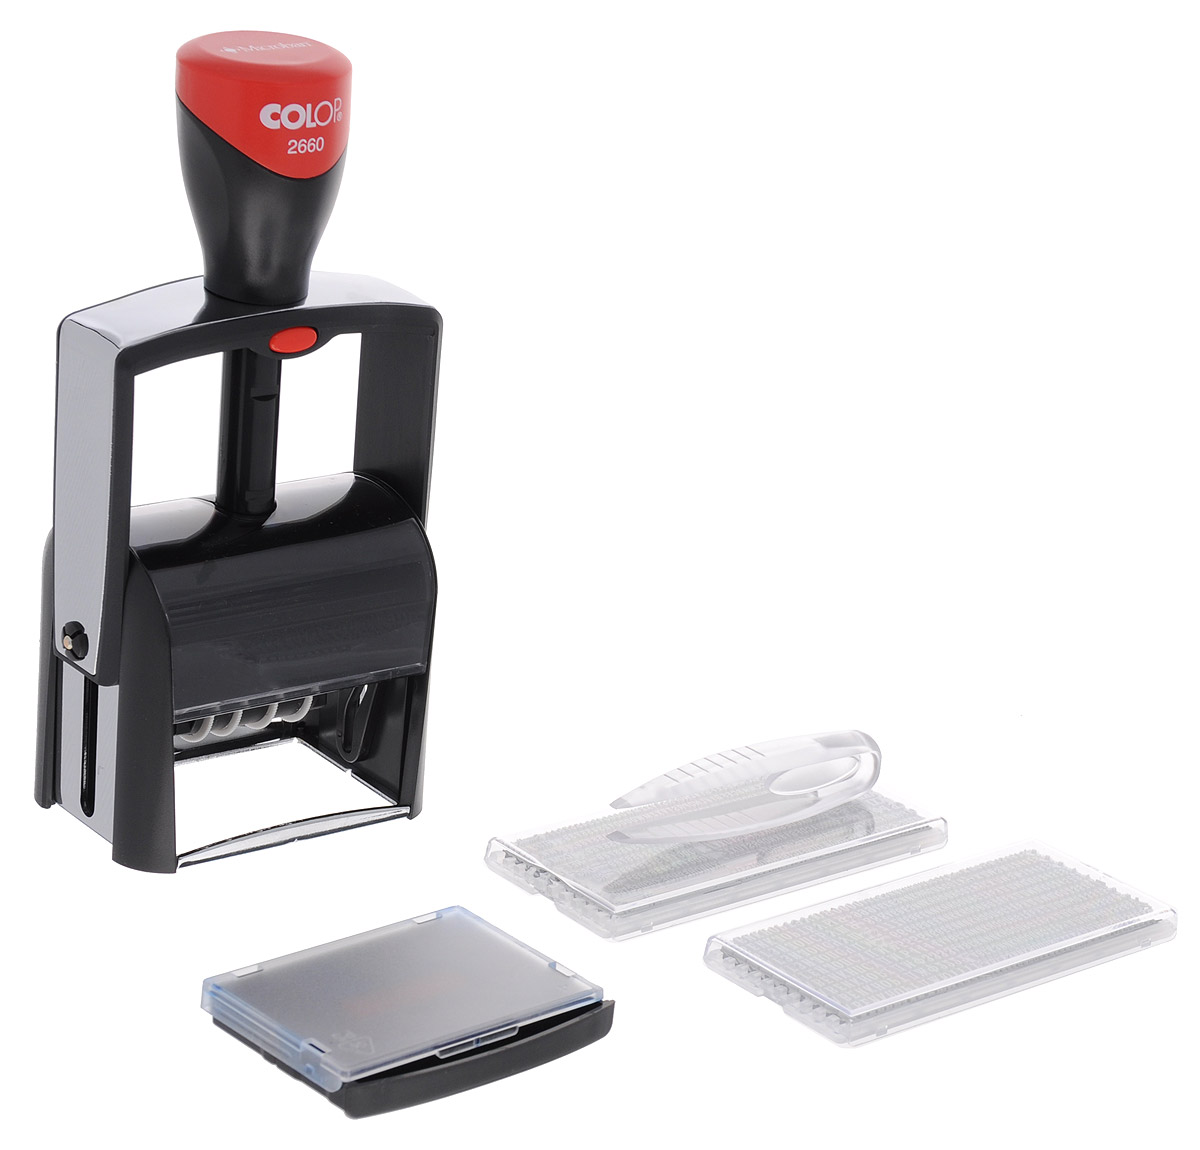 Colop Датер самонаборный S 2660 Bank-Set-F -  Печати, штампы